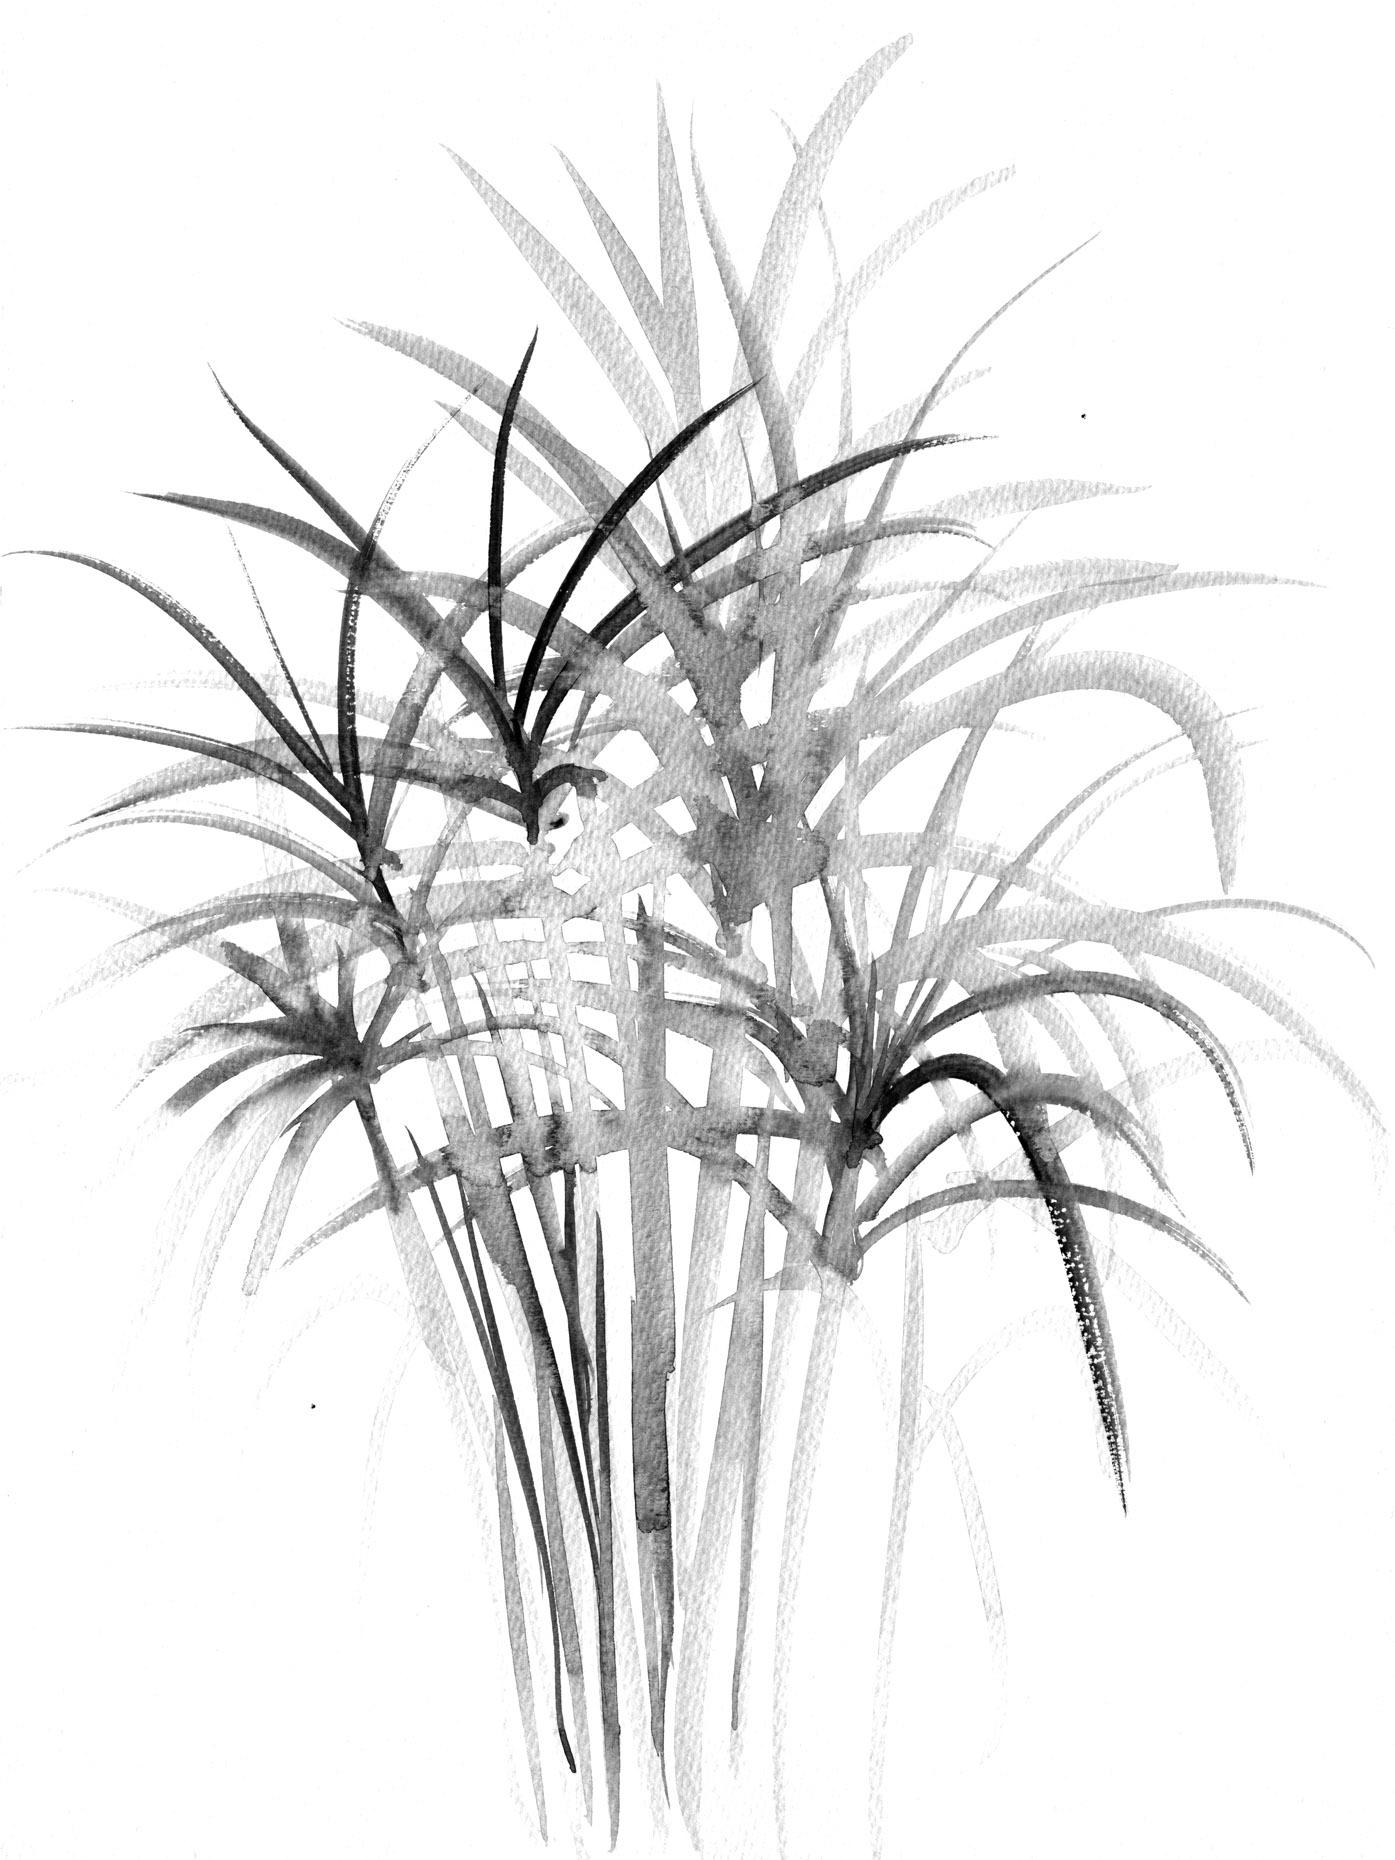 grassy tester lores